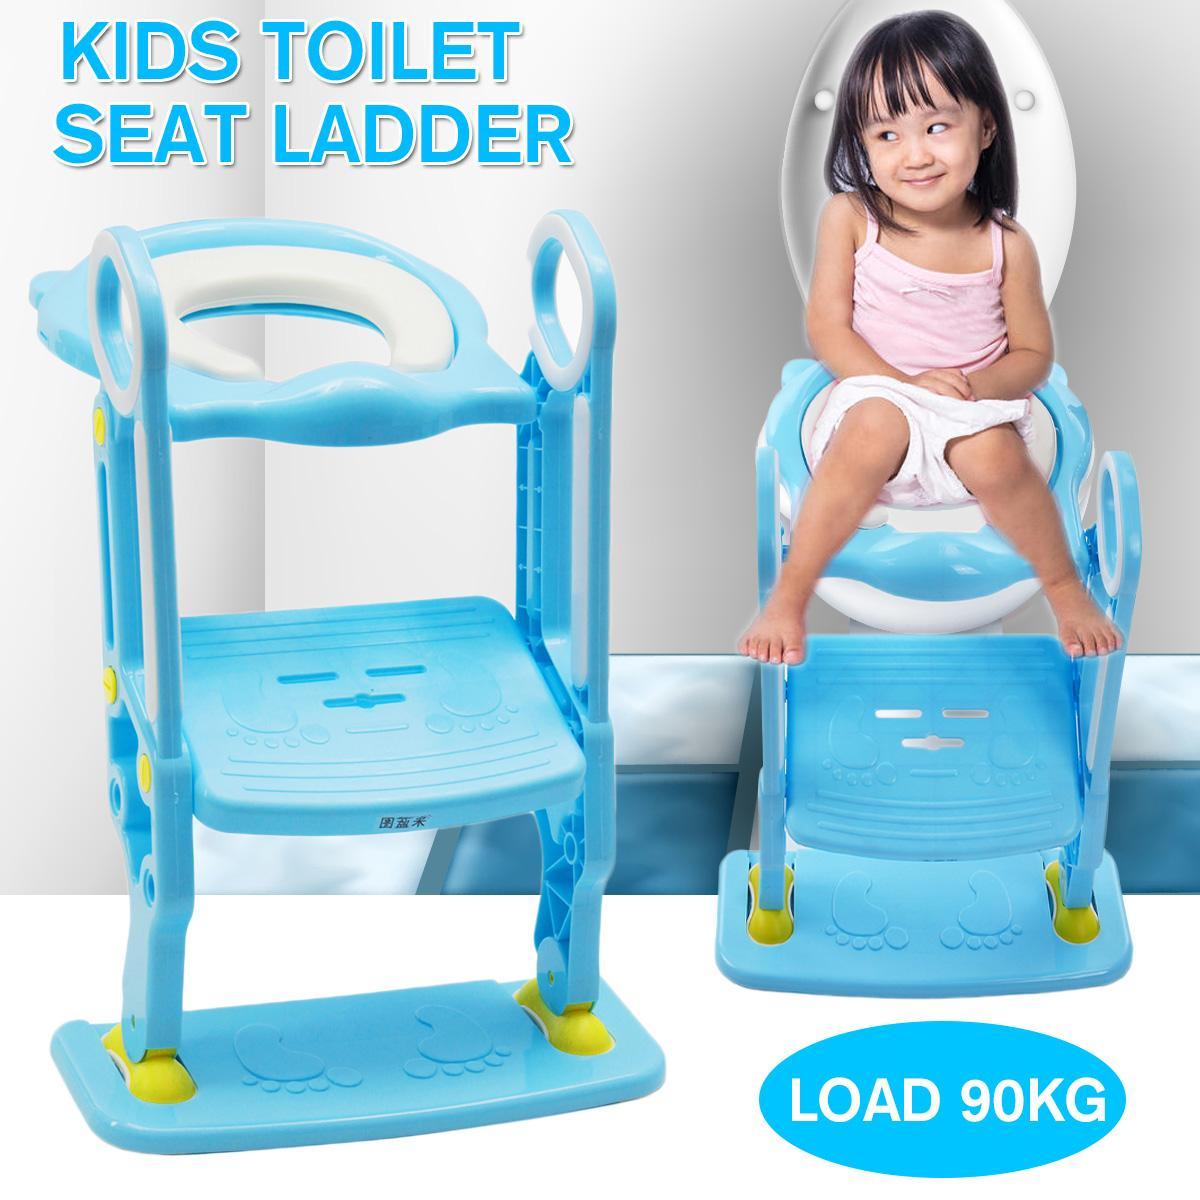 Folding Potty Infant Kids Toilet Training Seat Load 90KG with Adjustable Ladder Portable Urinal Potty Training Seats Seat Ladder